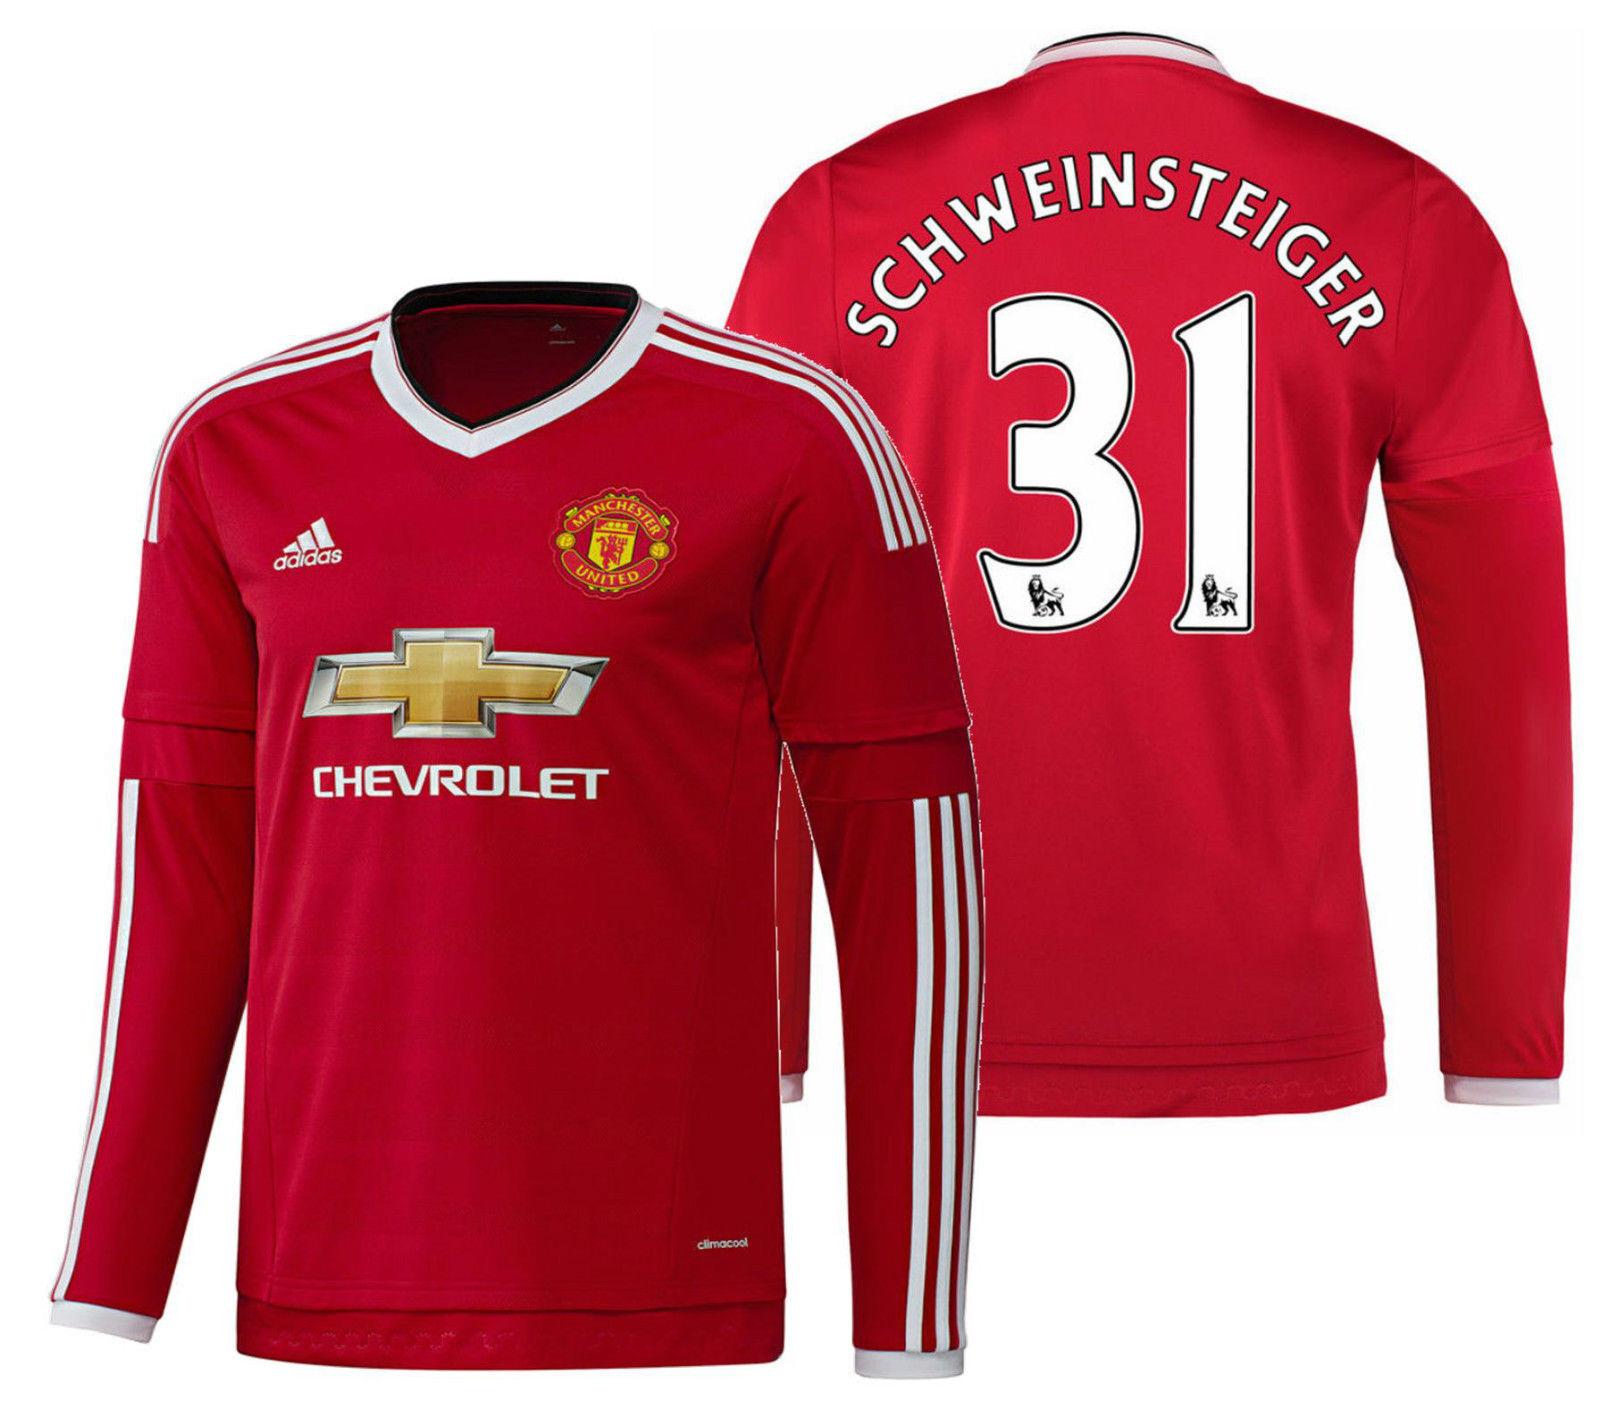 Adidas Claro Schweinsteiger Manchester United Manga Larga Home Jersey 2015 16